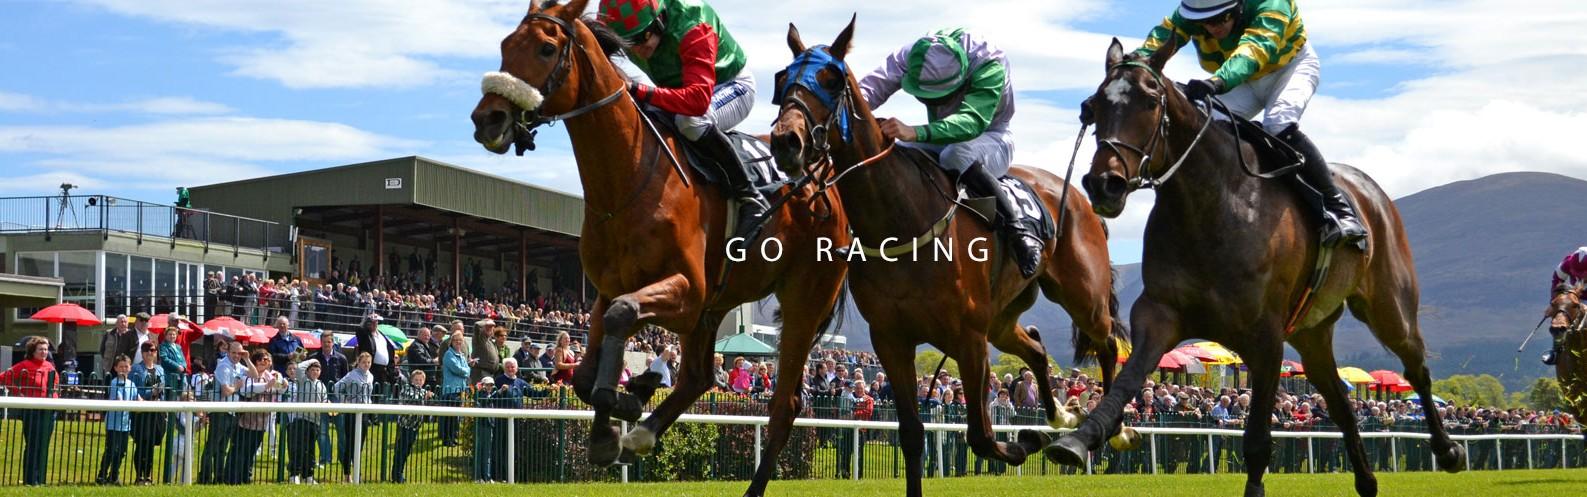 Racing banner image